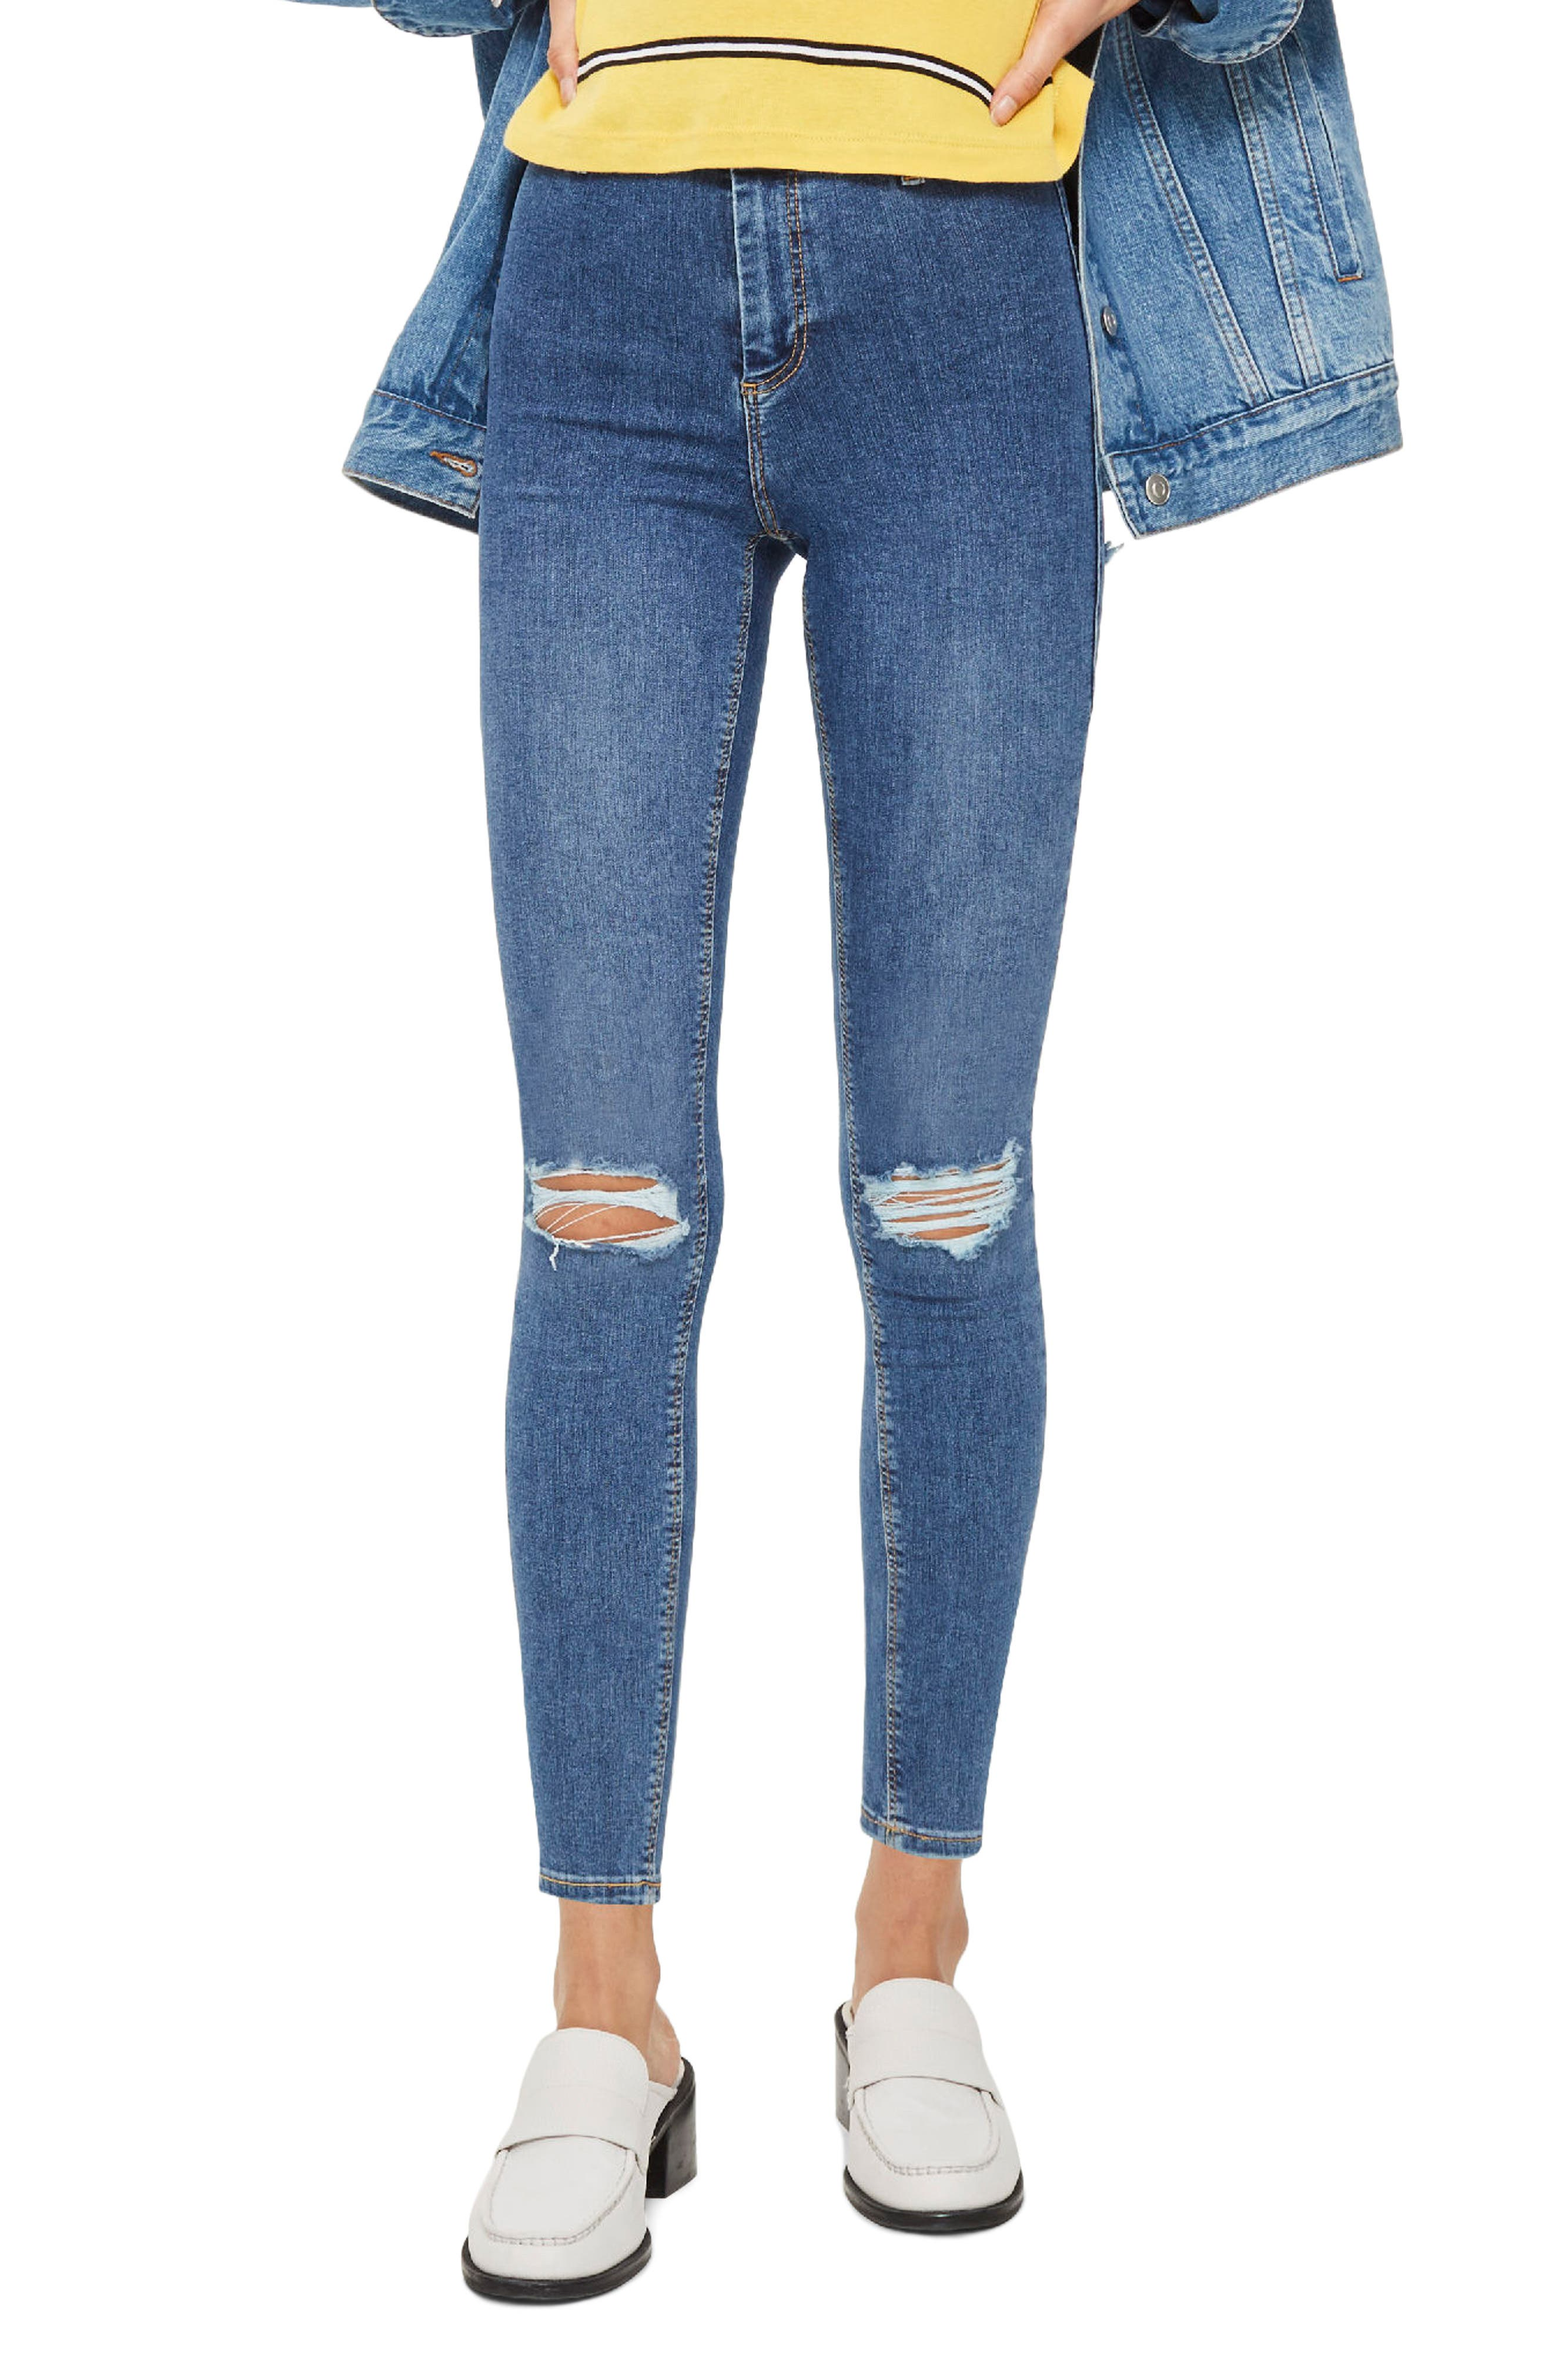 Joni Distressed Skinny Jeans,                             Main thumbnail 1, color,                             Mid Denim